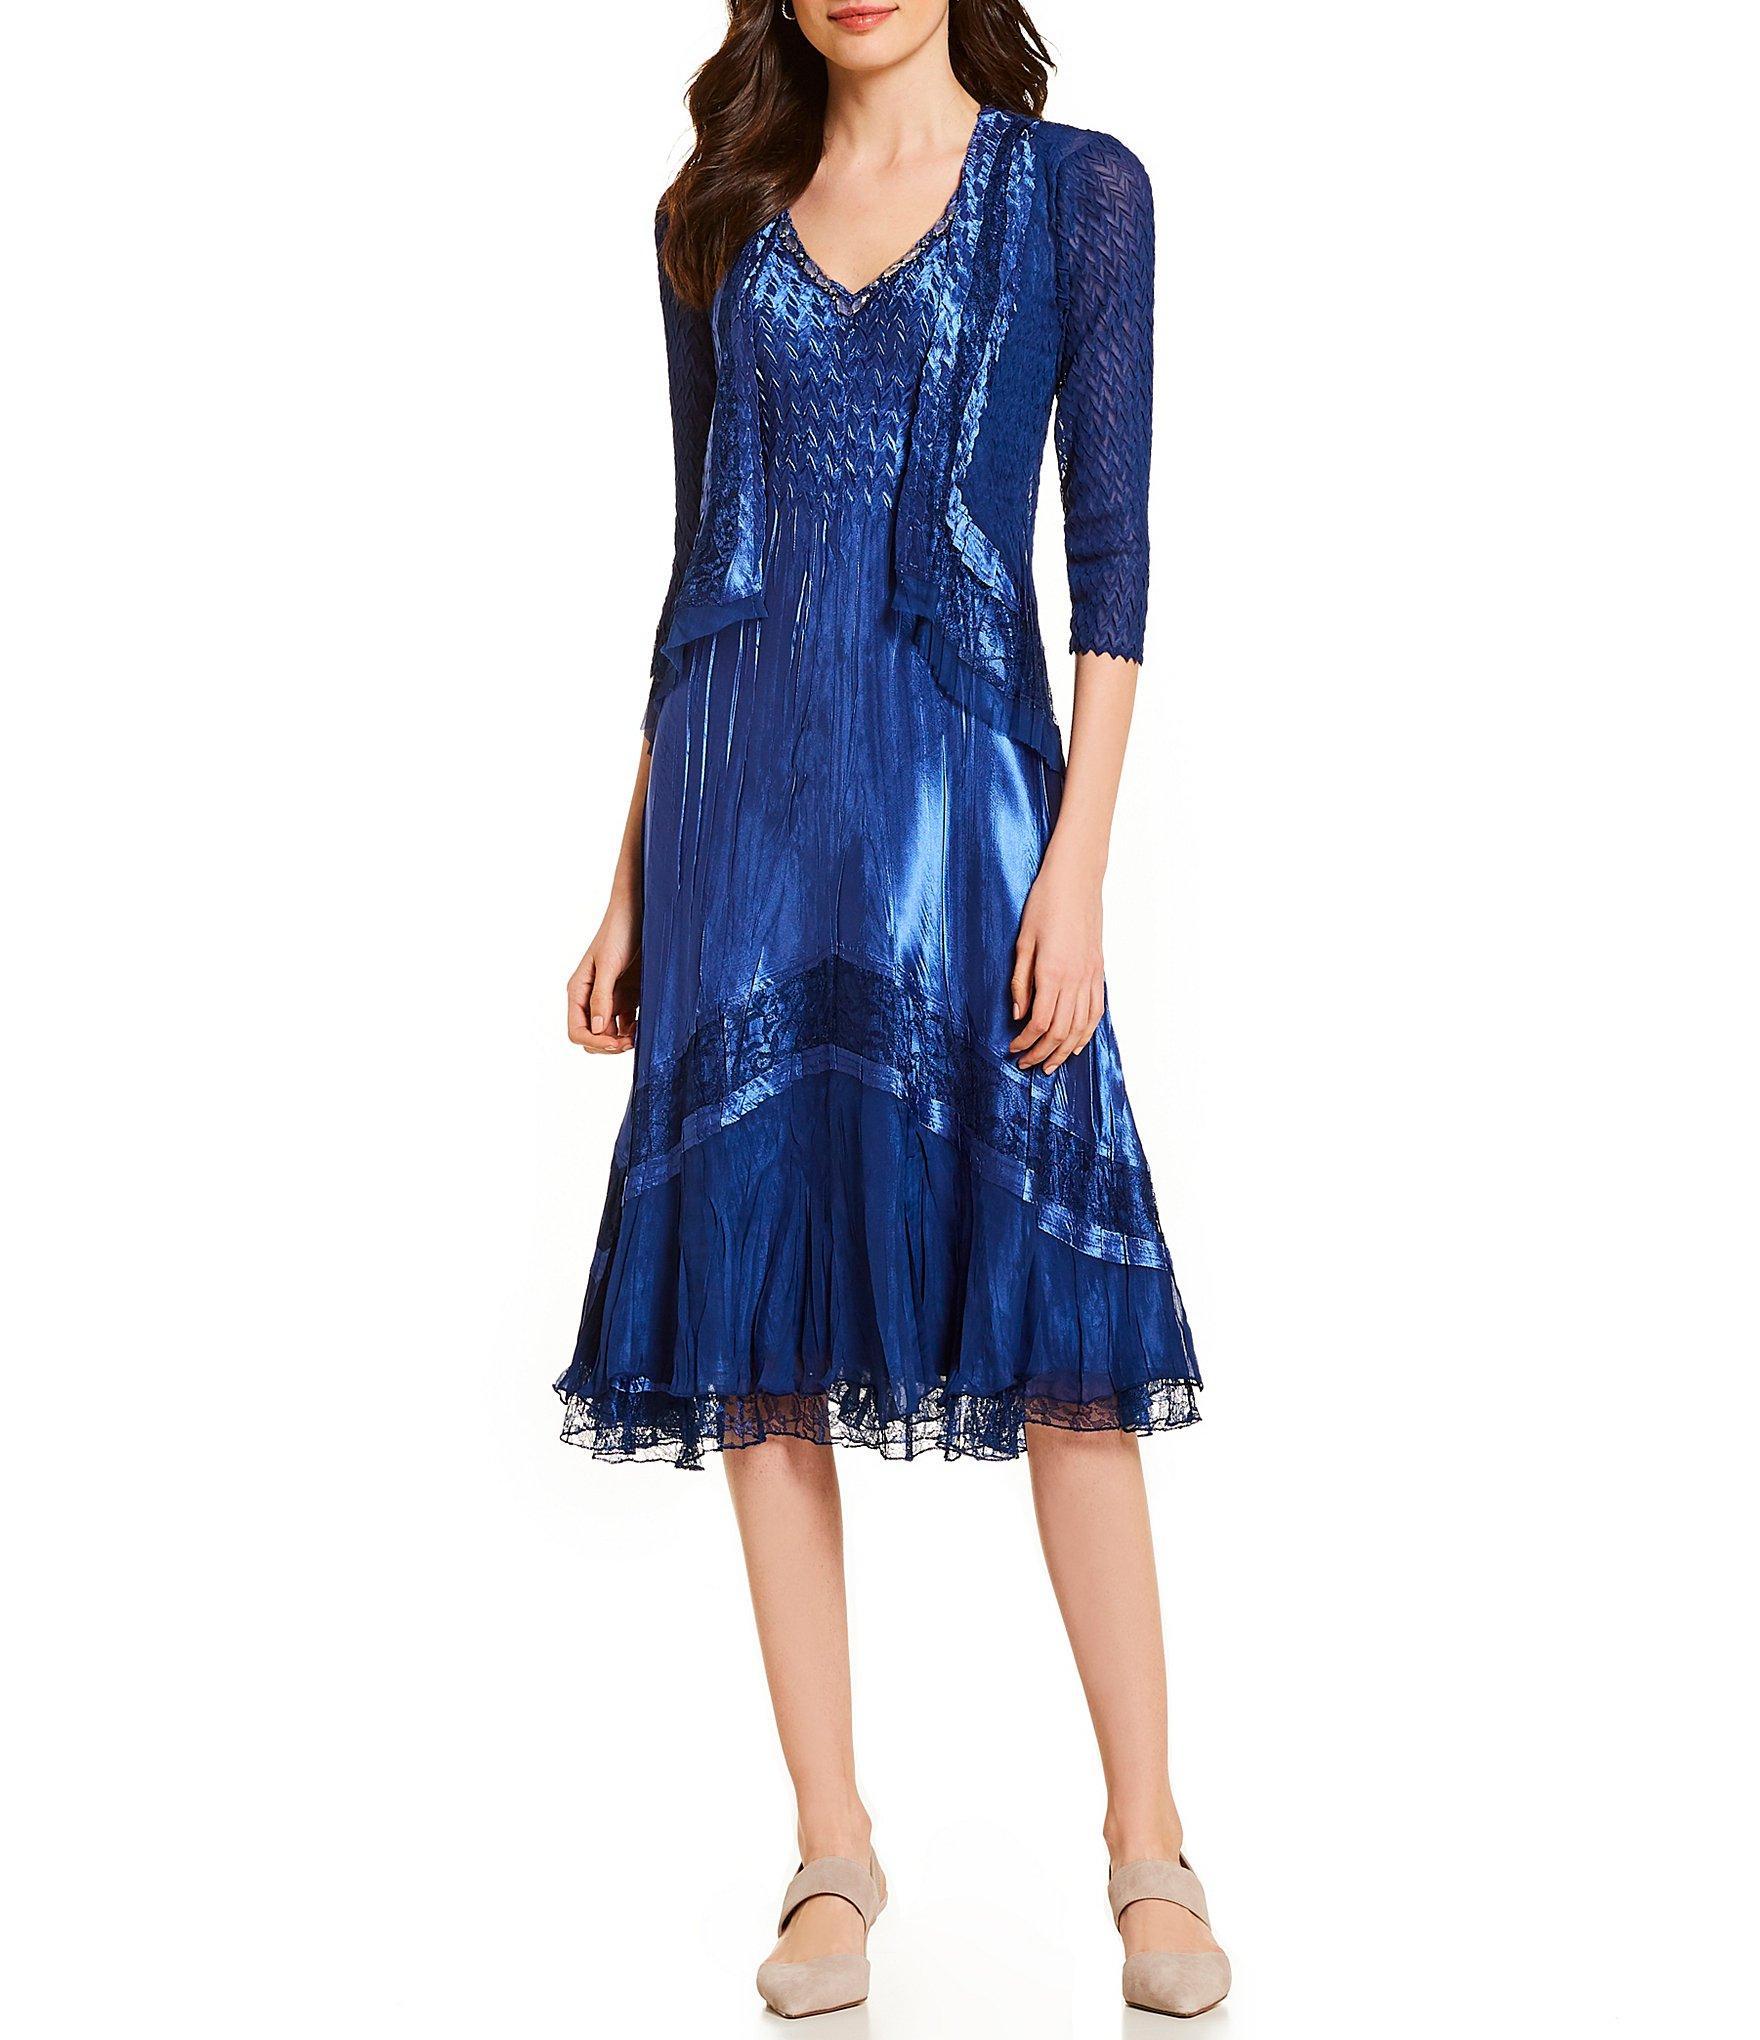 d1c59864f4 Komarov. Women s Blue 3 4 Sleeve Jacket Ombre Lace Detail V-neck Midi Dress